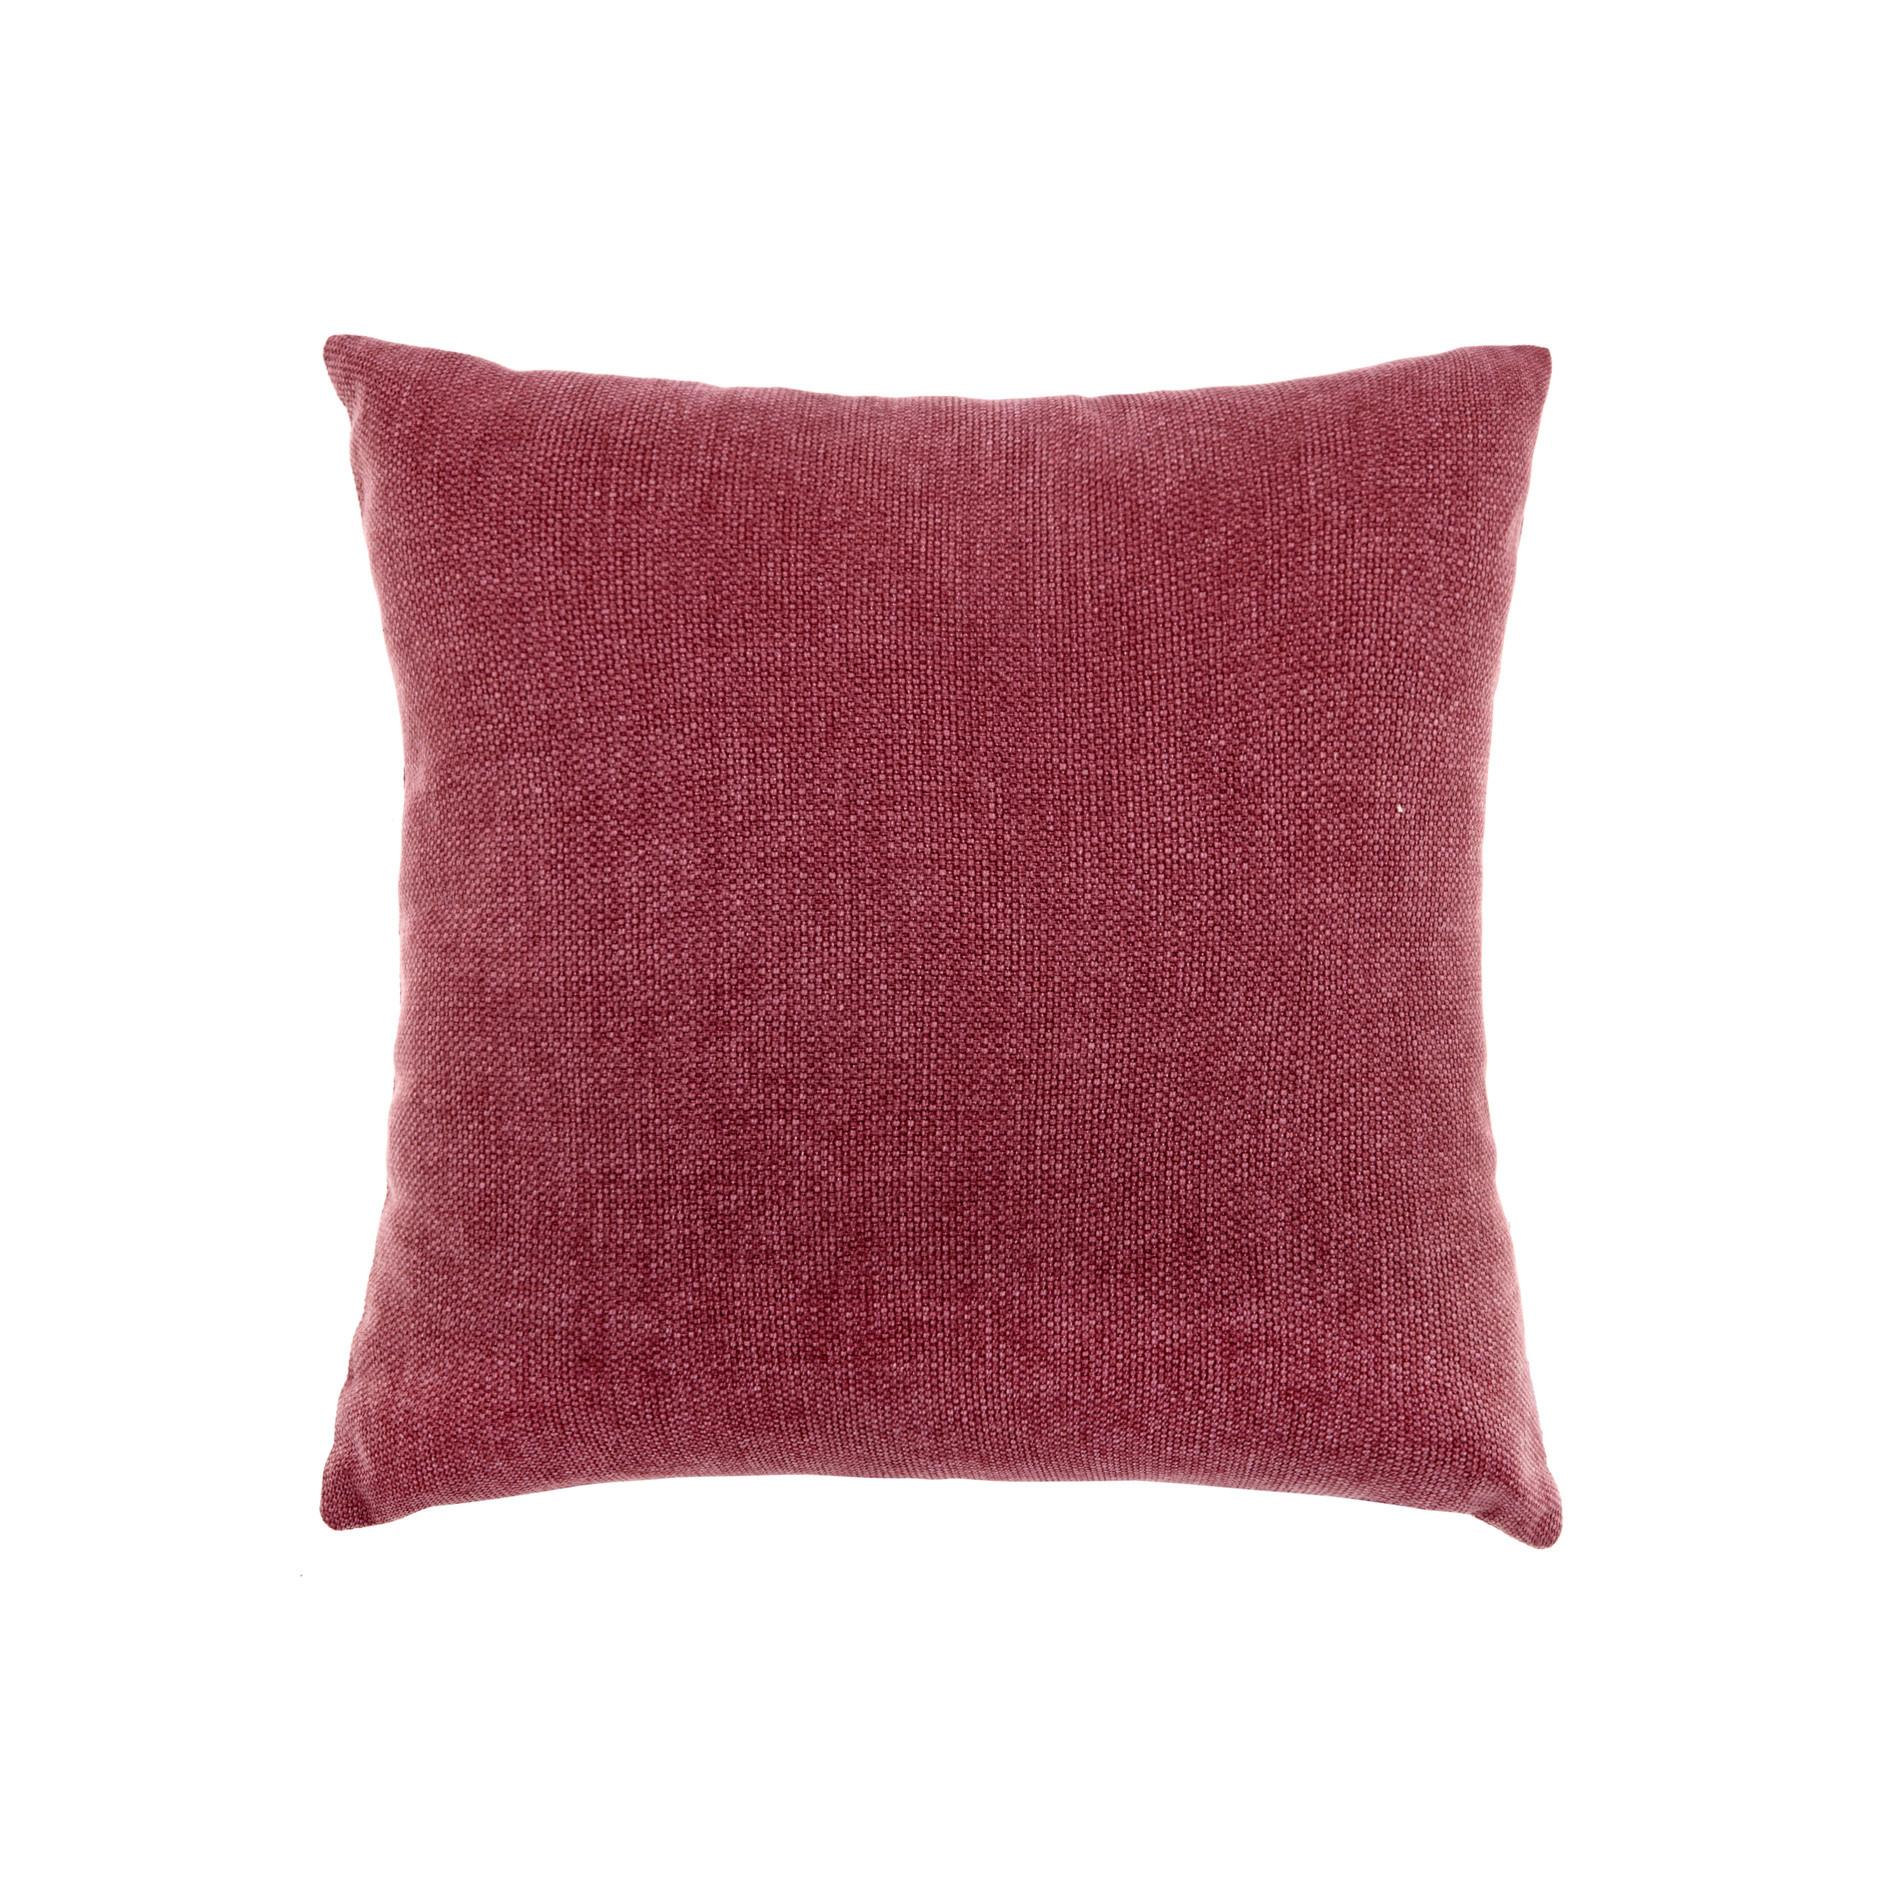 Cuscino tinta unita effetto sfumato, Rosso bordeaux, large image number 0